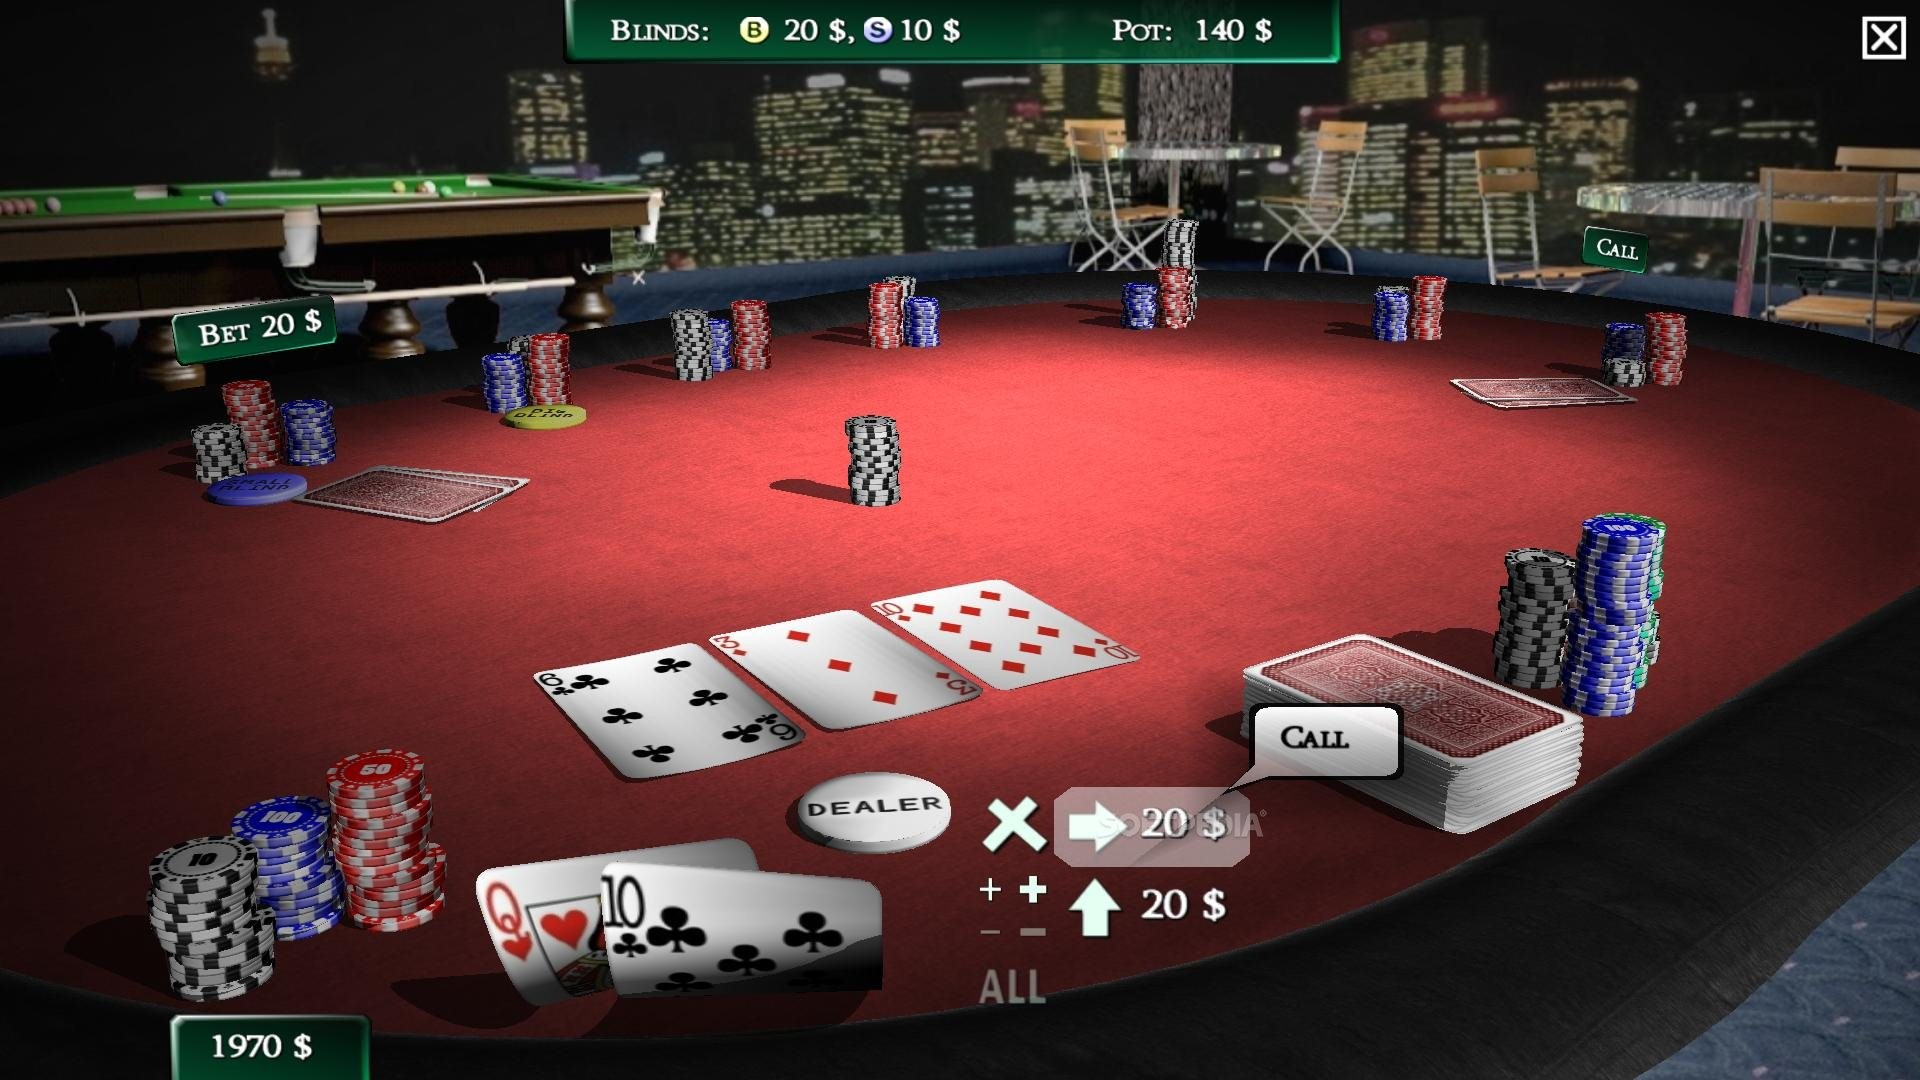 Wood poker table